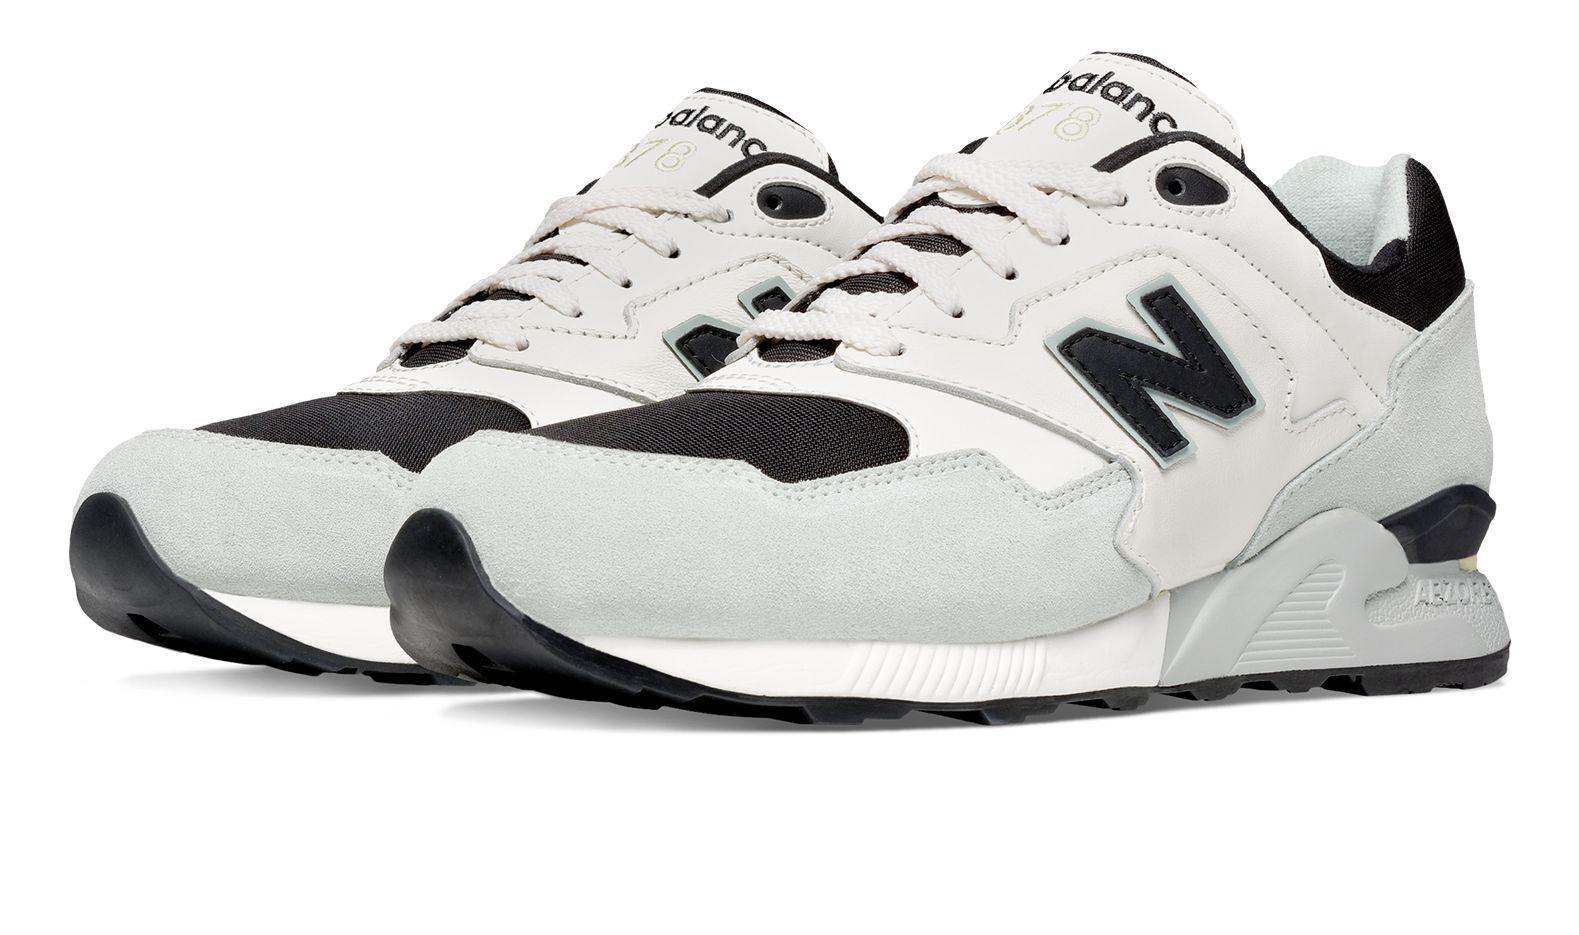 35b4e70c1289 Fitness Mania – New Balance 878 Men s Lifestyle Shoes – ML878GW